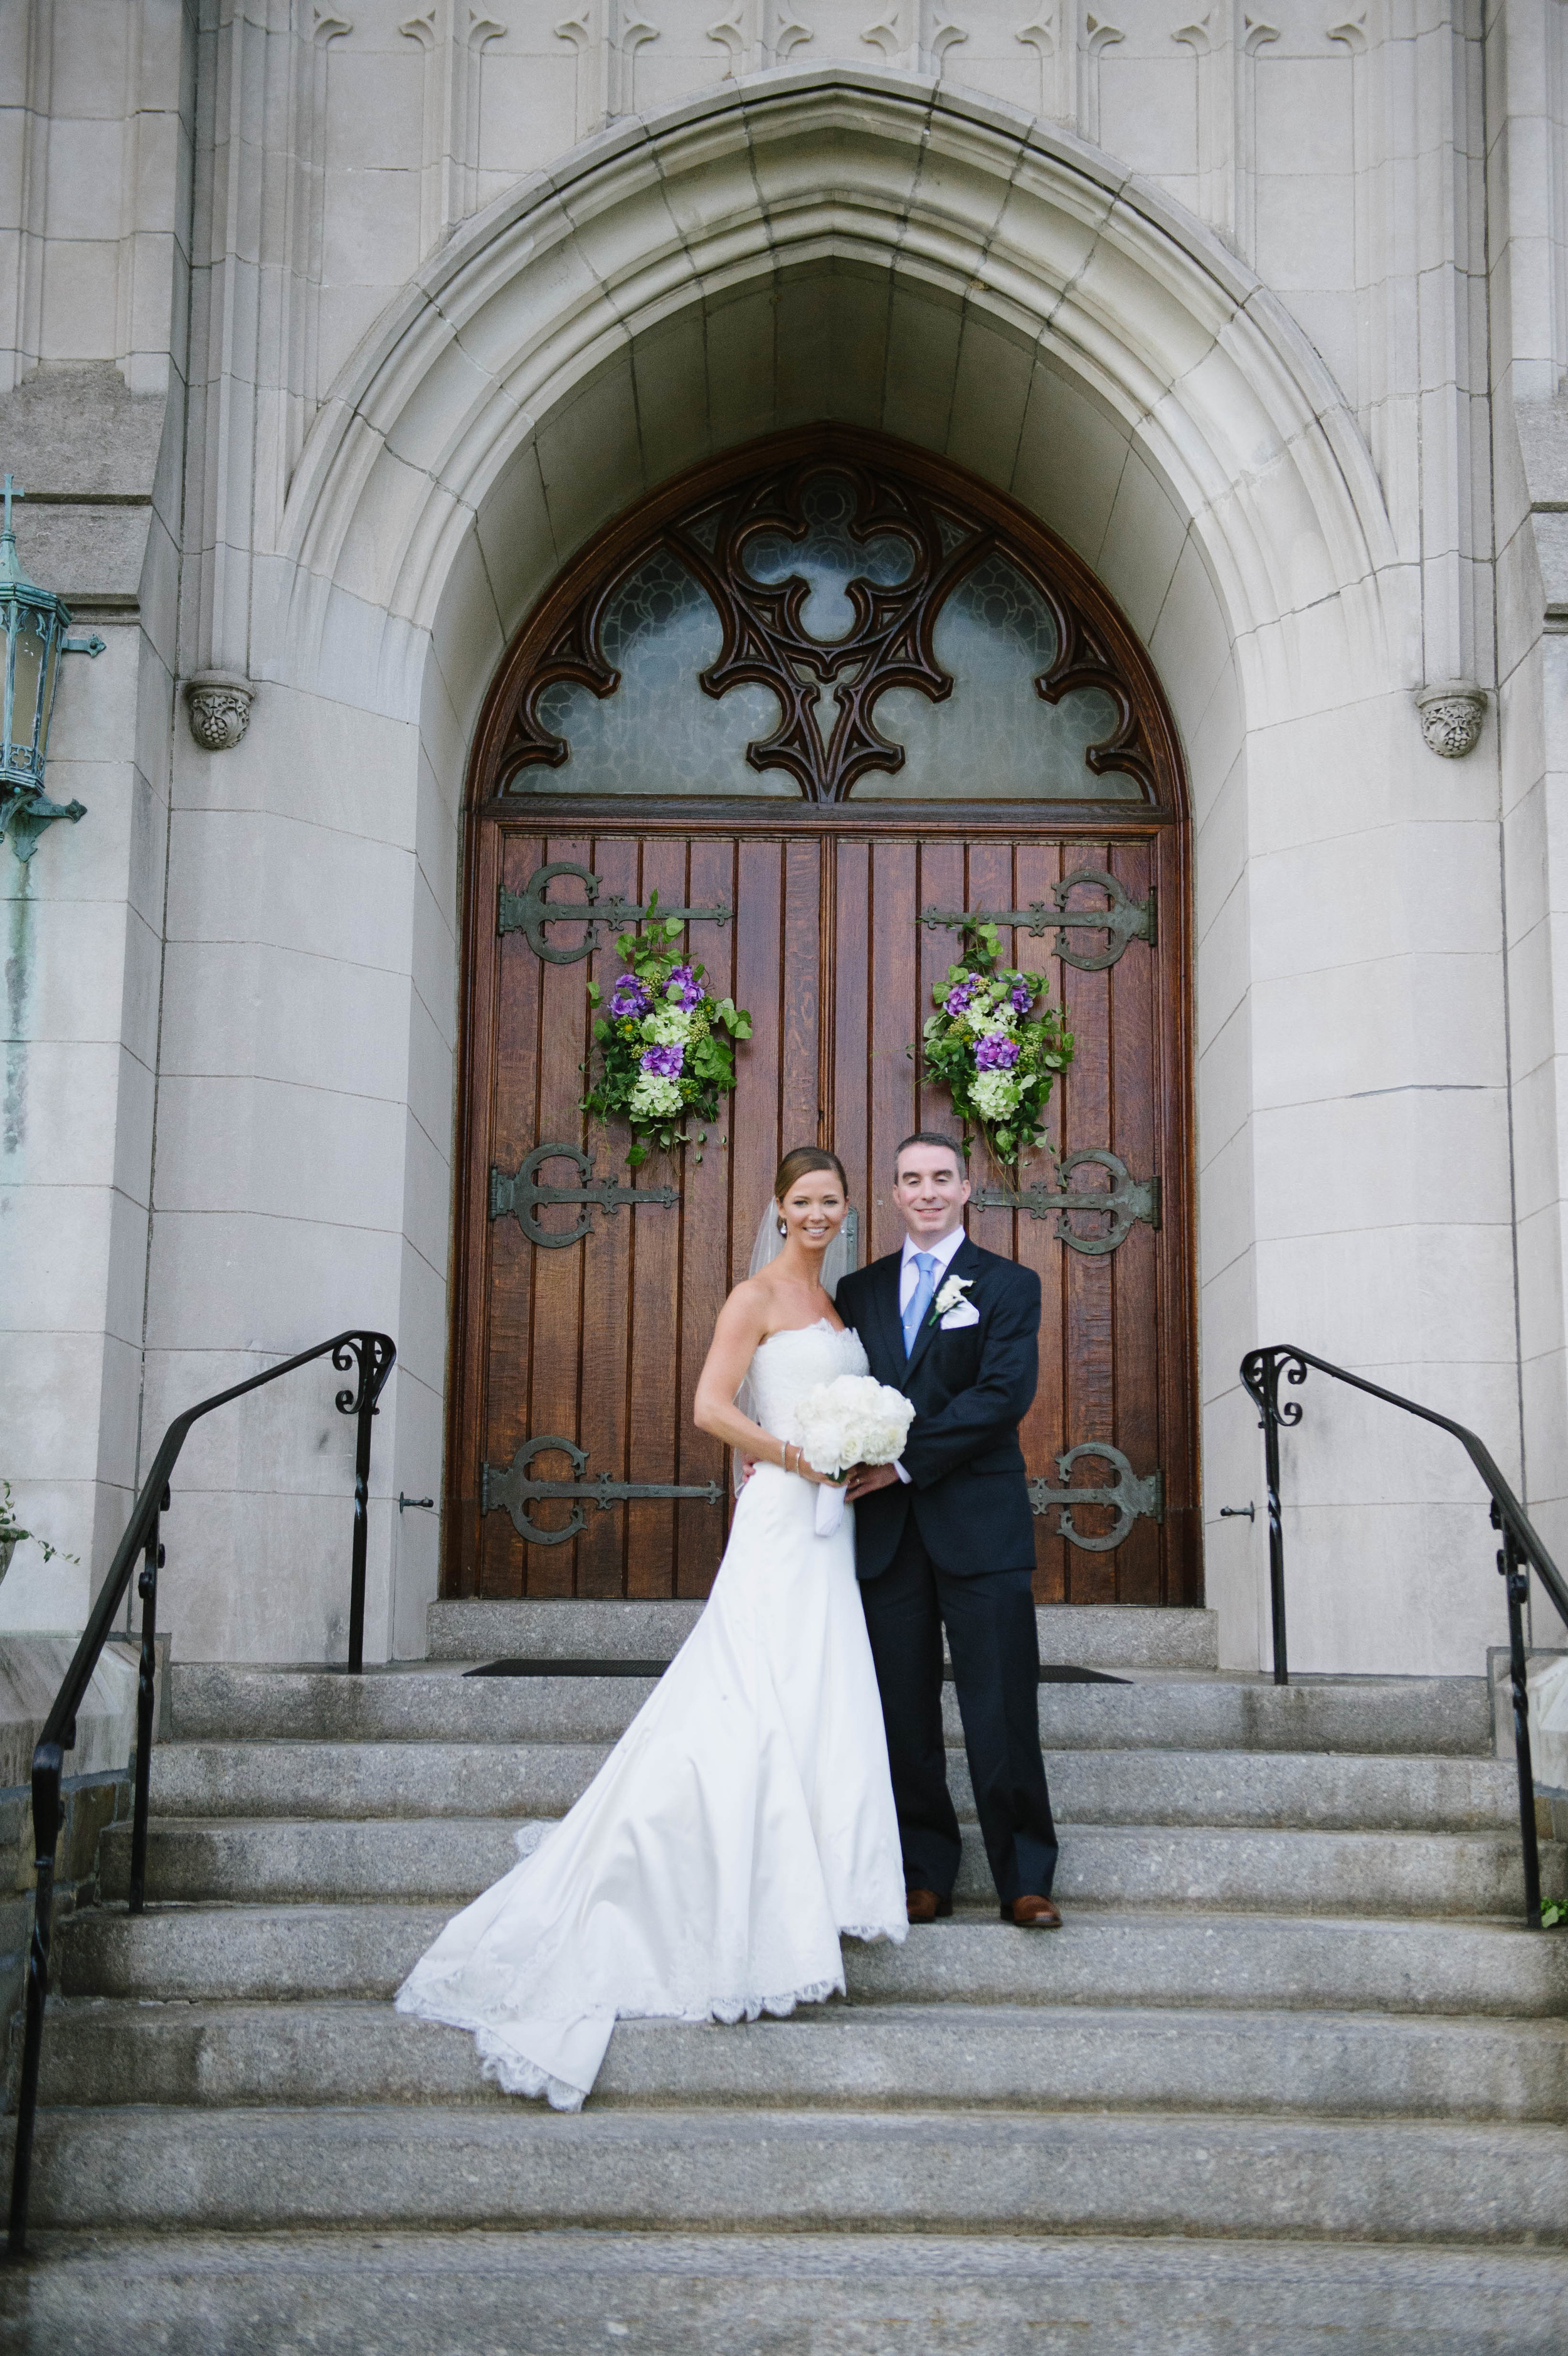 Colonial_Hall_Wedding030.jpg